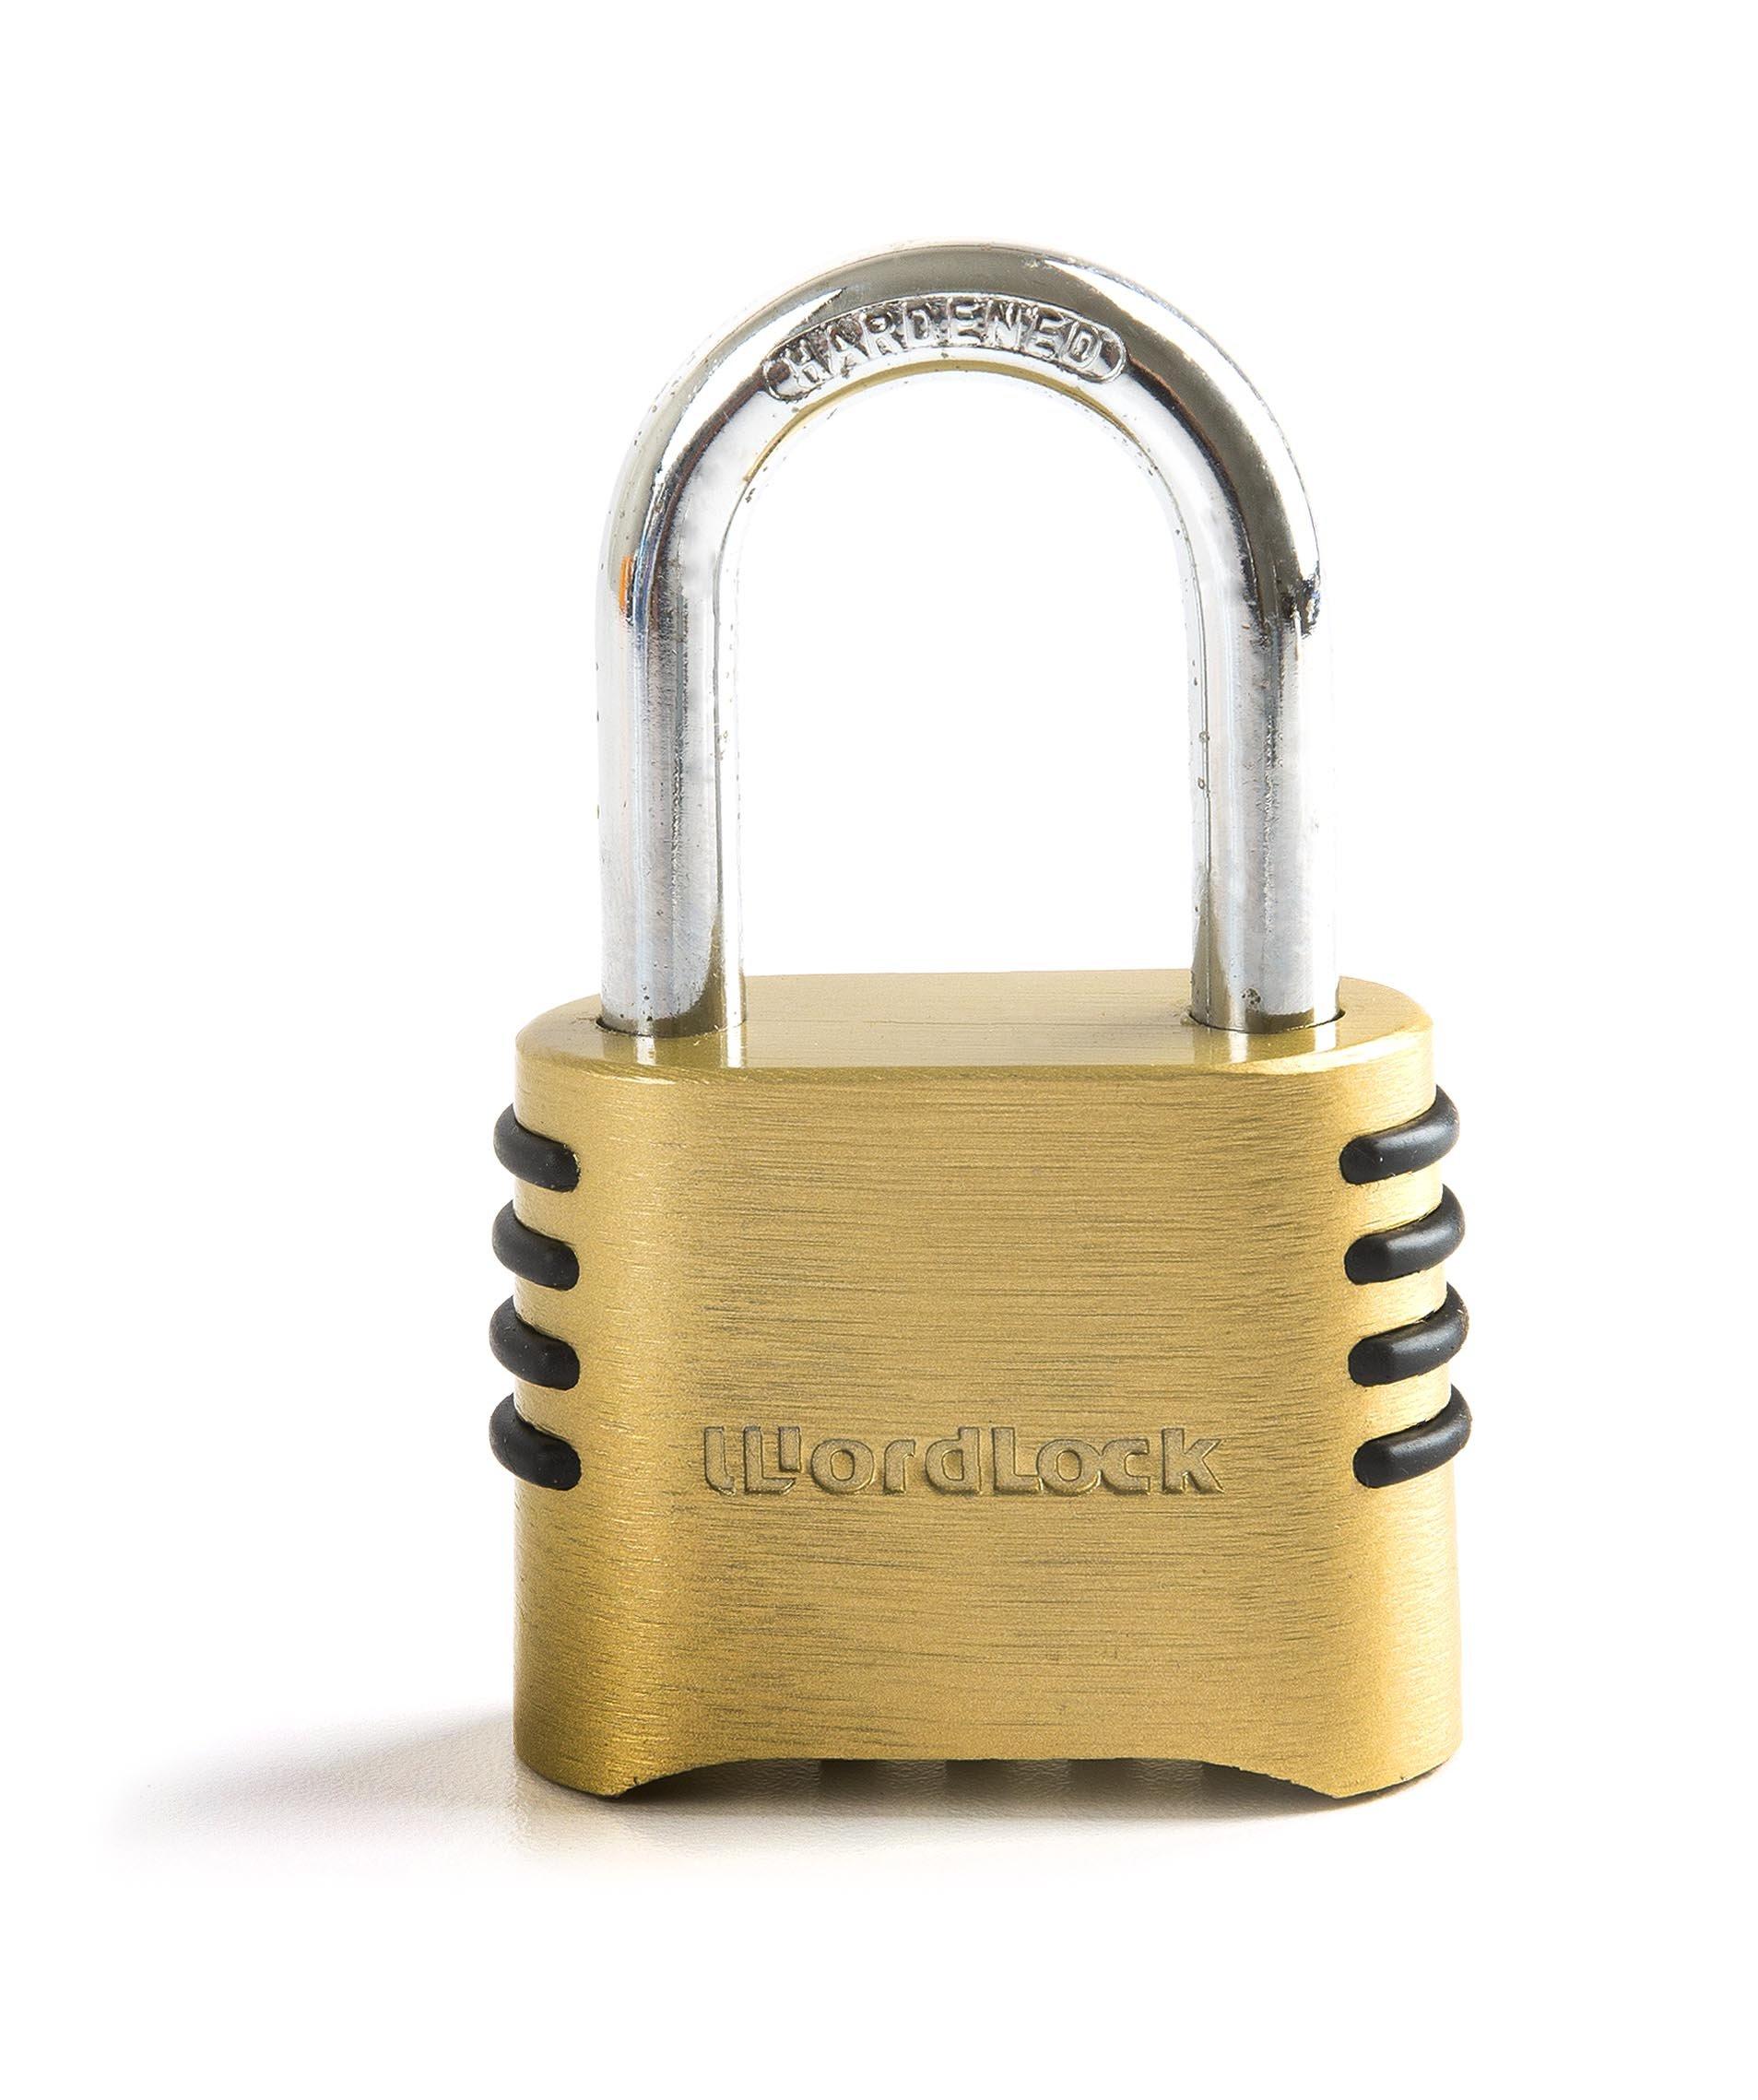 Wordlock Utility Combination Padlock – 4 Dial